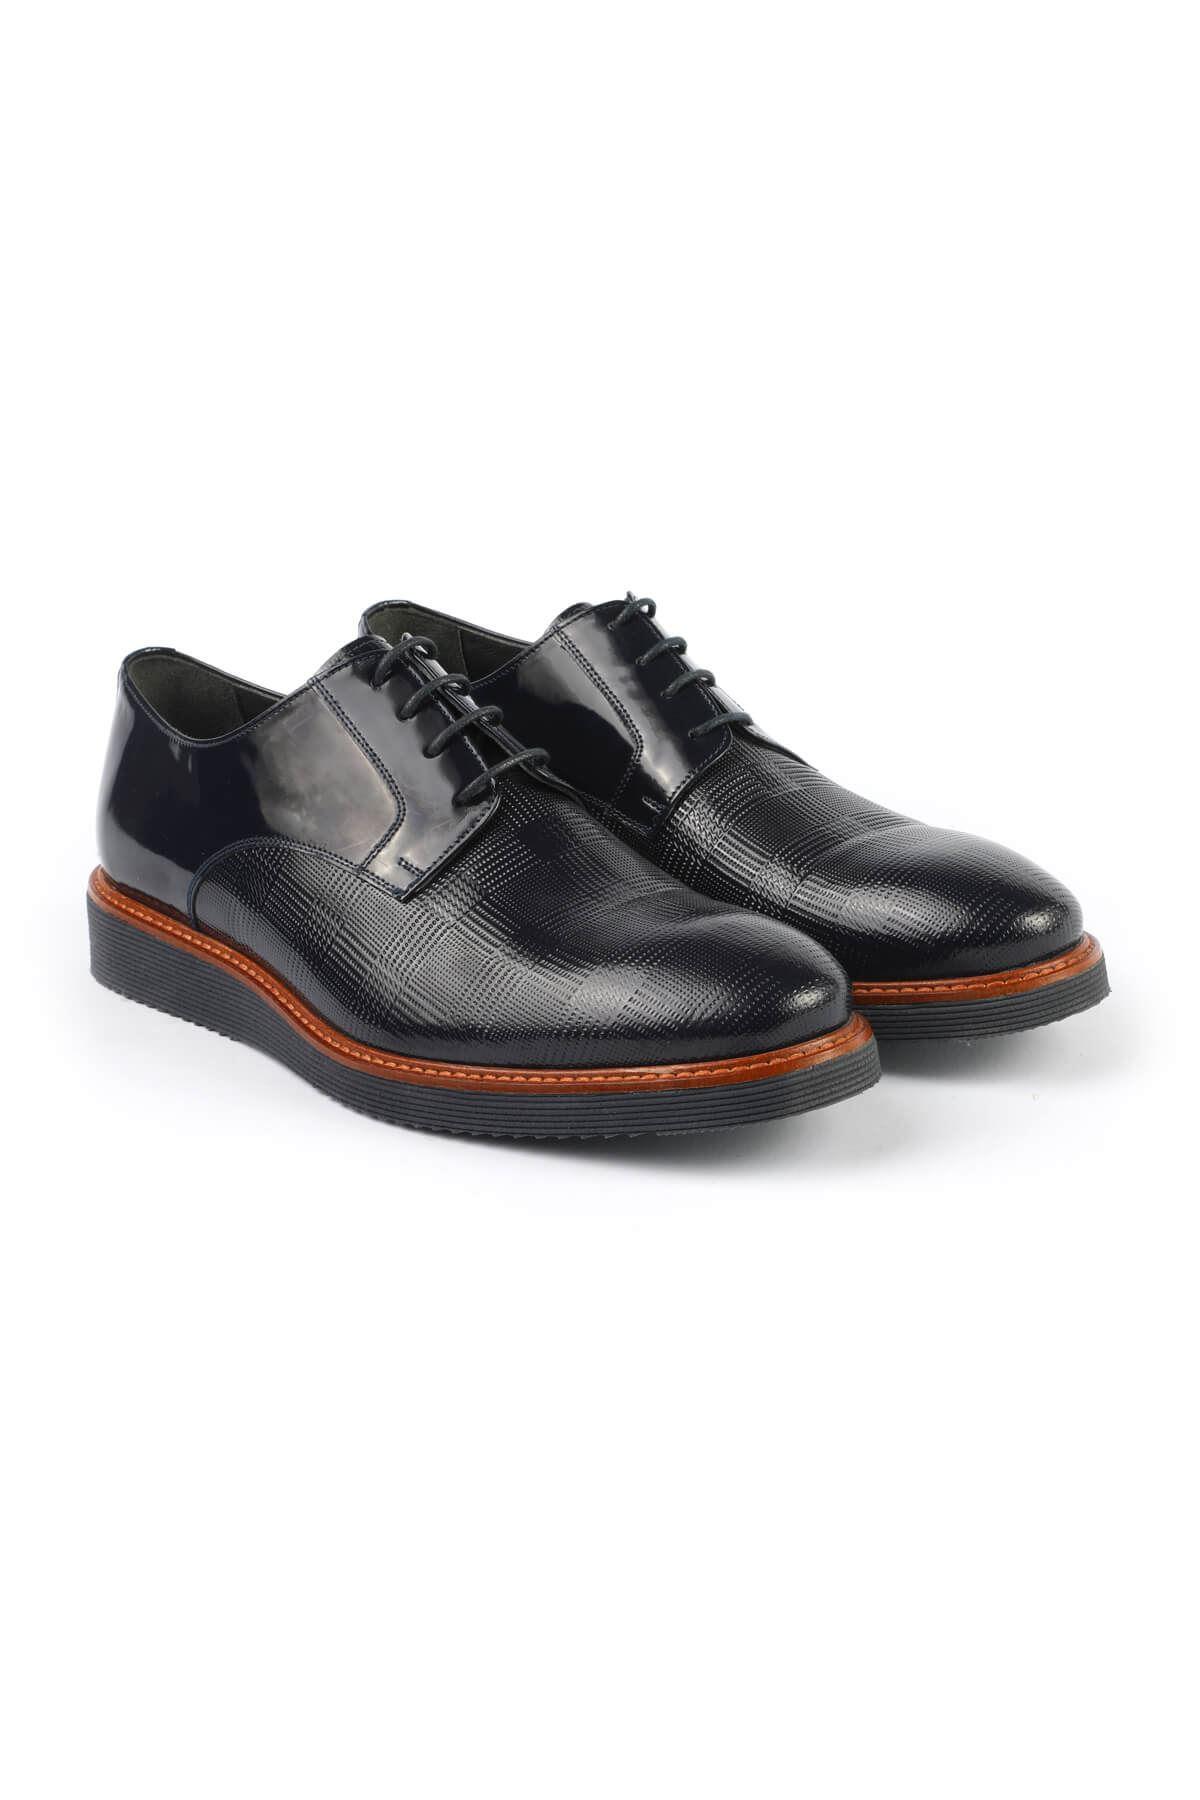 Libero C494 Navy Blue Casual Shoes